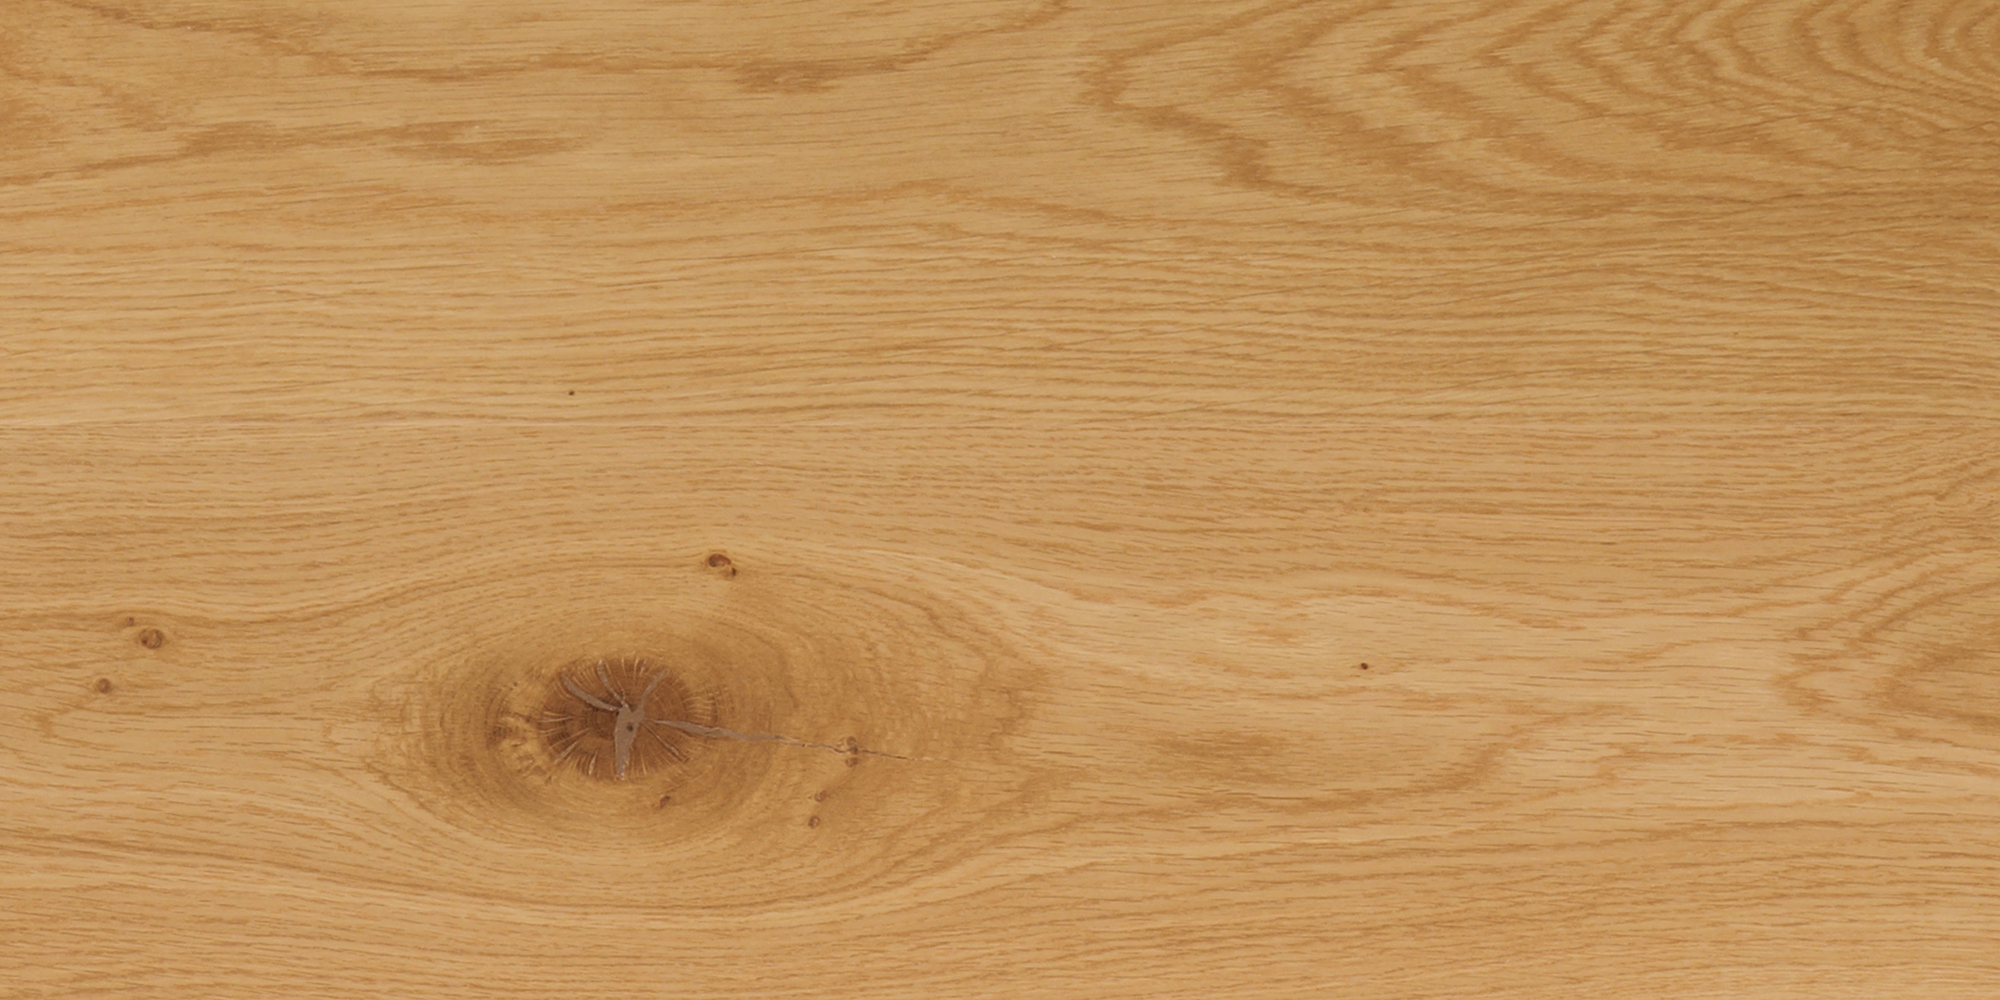 Grades Of Lumber For Flooring ~ Wood flooring grades explained woodpecker